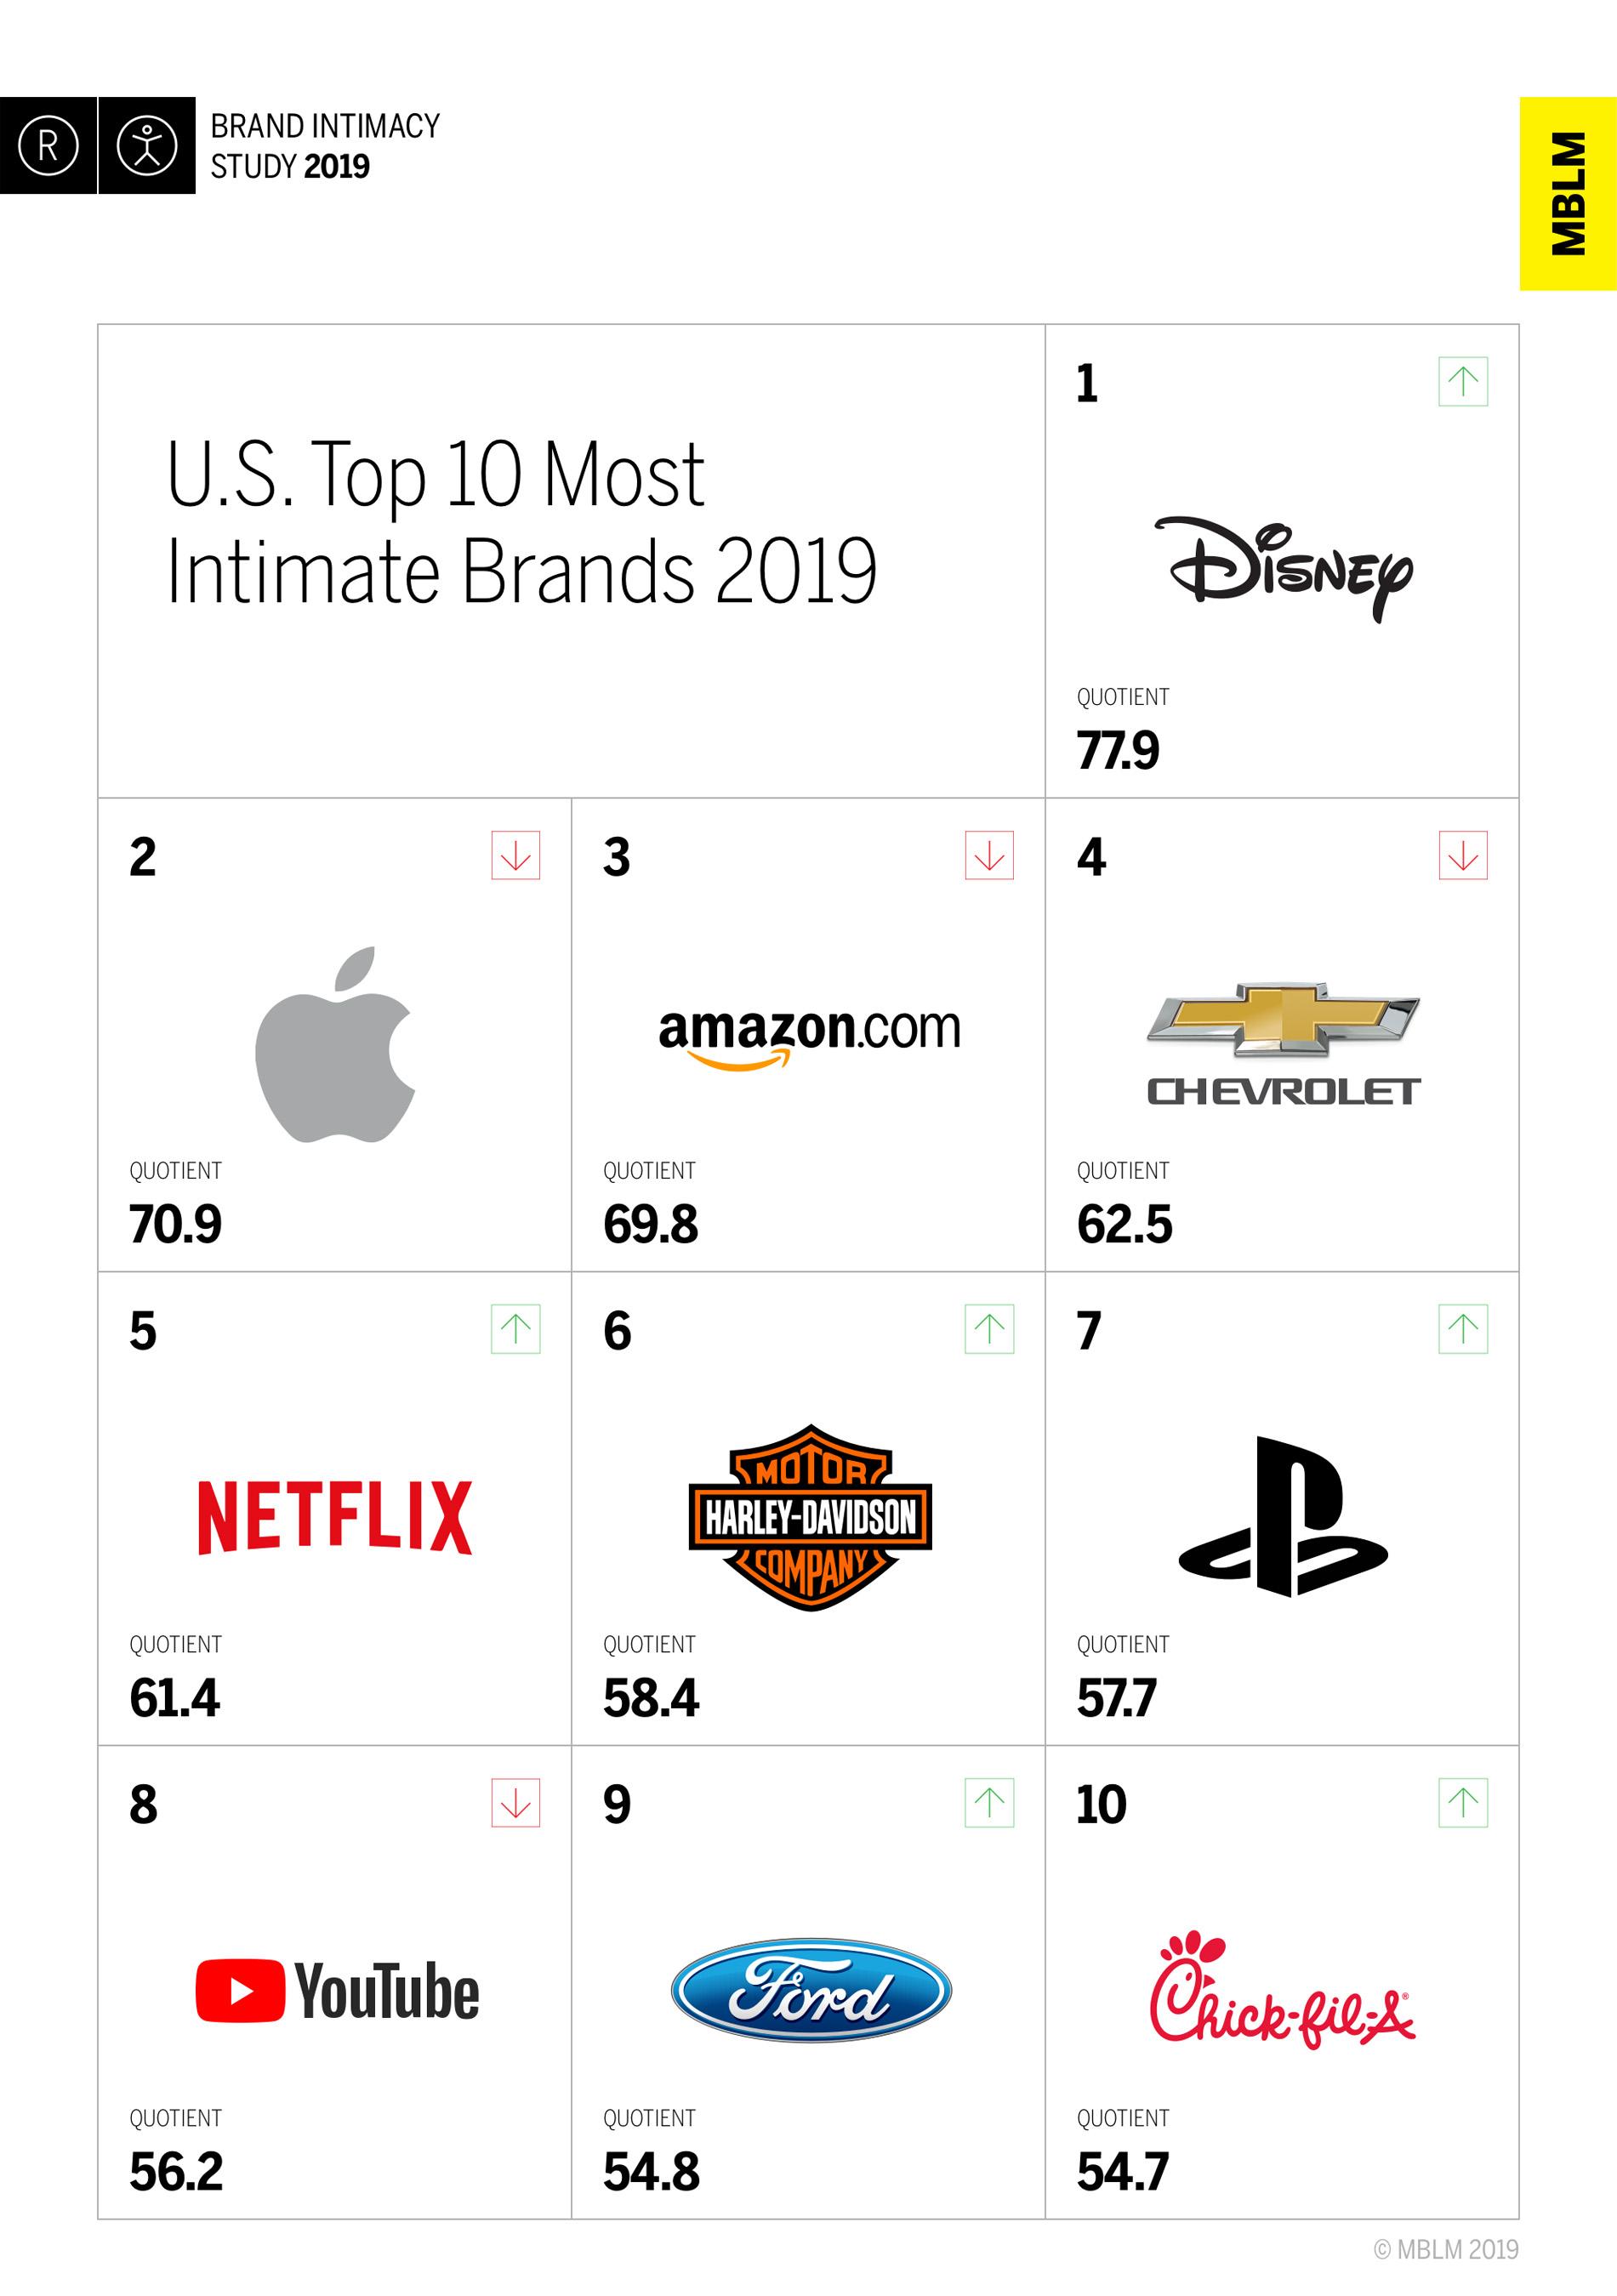 U.S. Top 10 Most Intimate Brands 2019